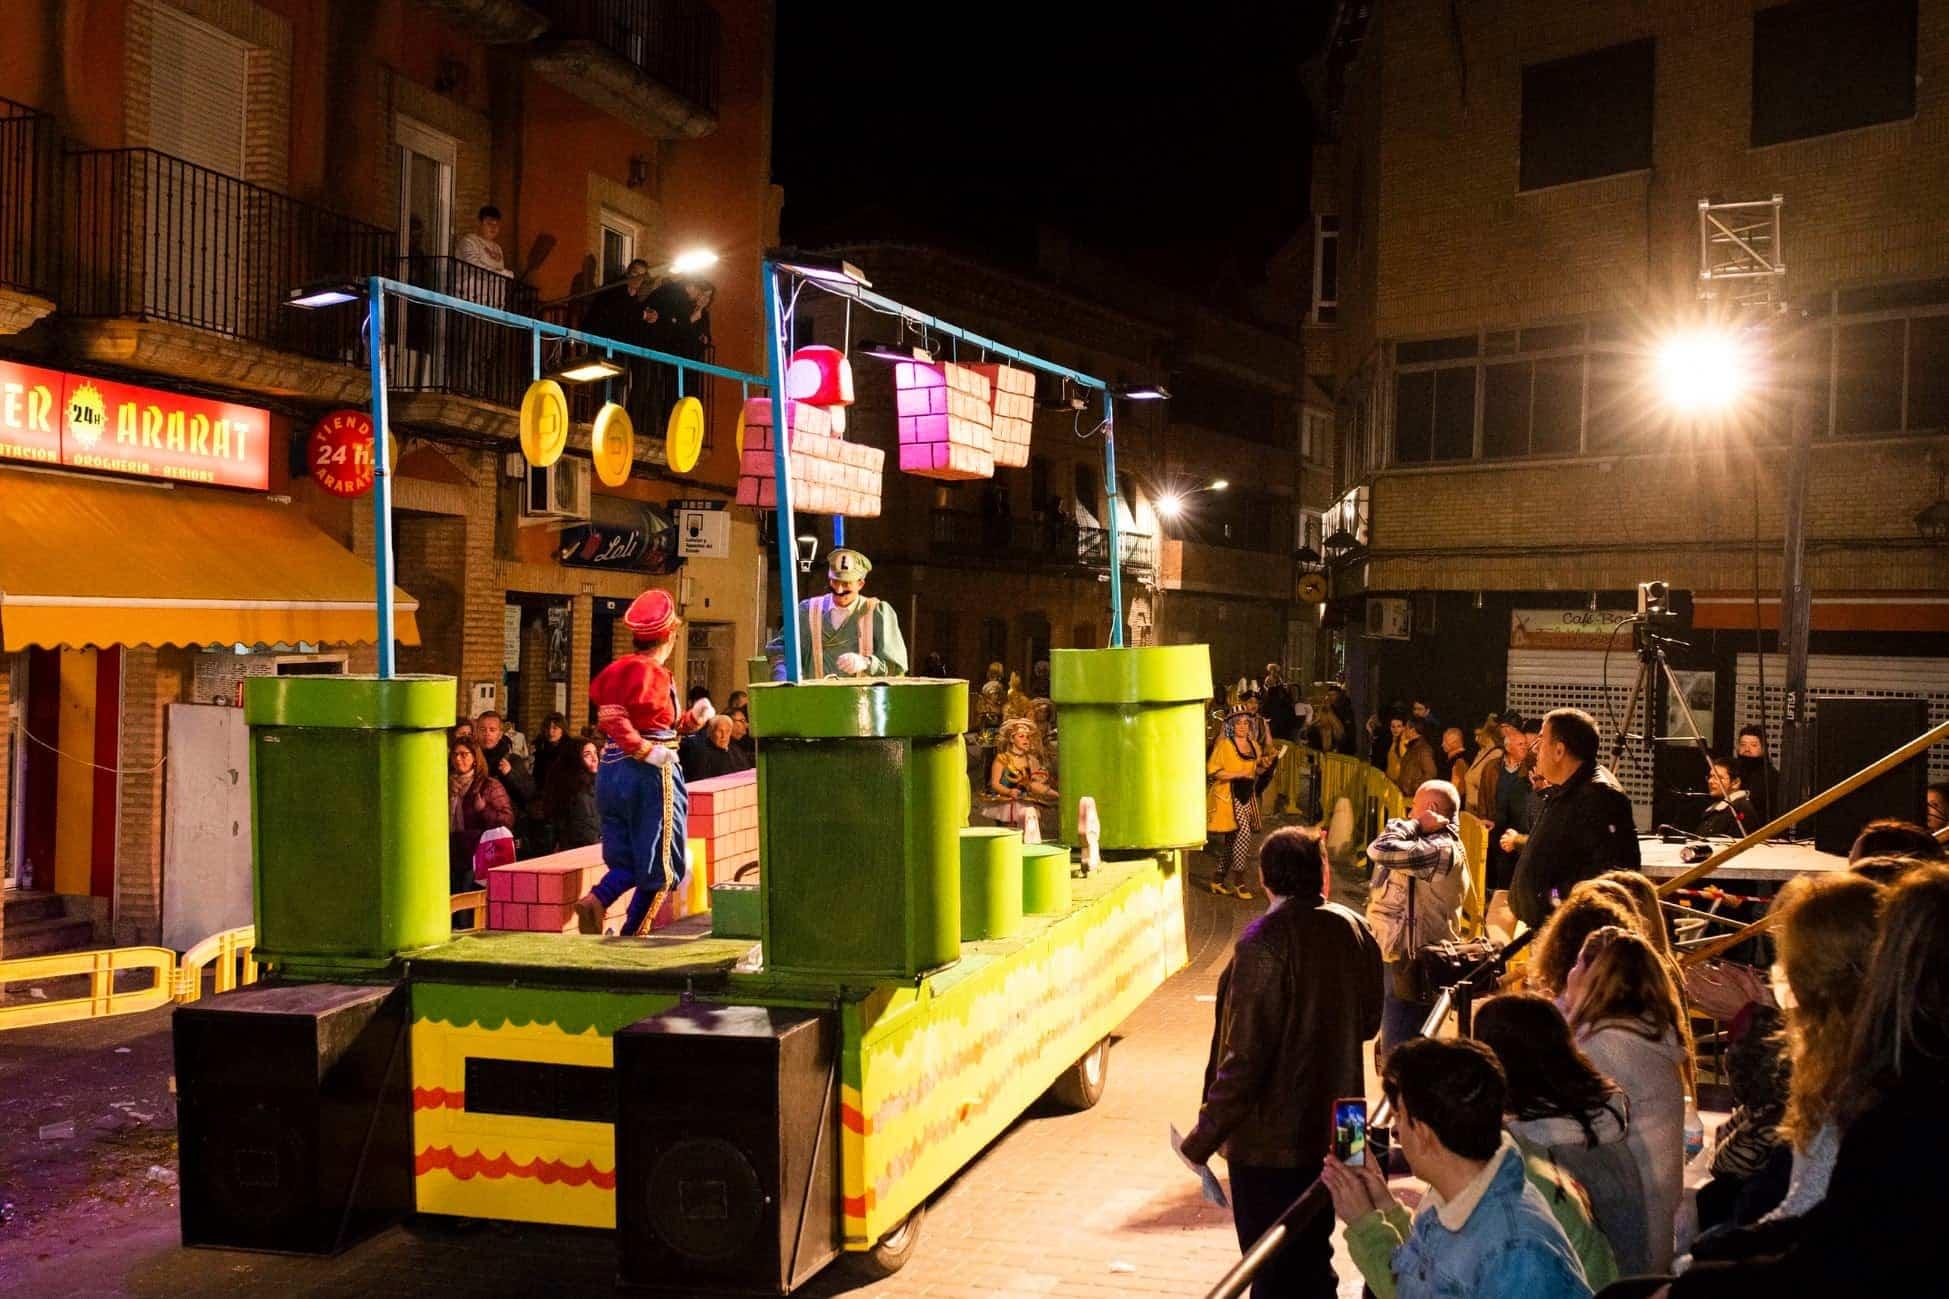 Carnaval de herencia 2020 ofertorio 13 - Selección de fotografías del Ofertorio del Carnaval de Herencia